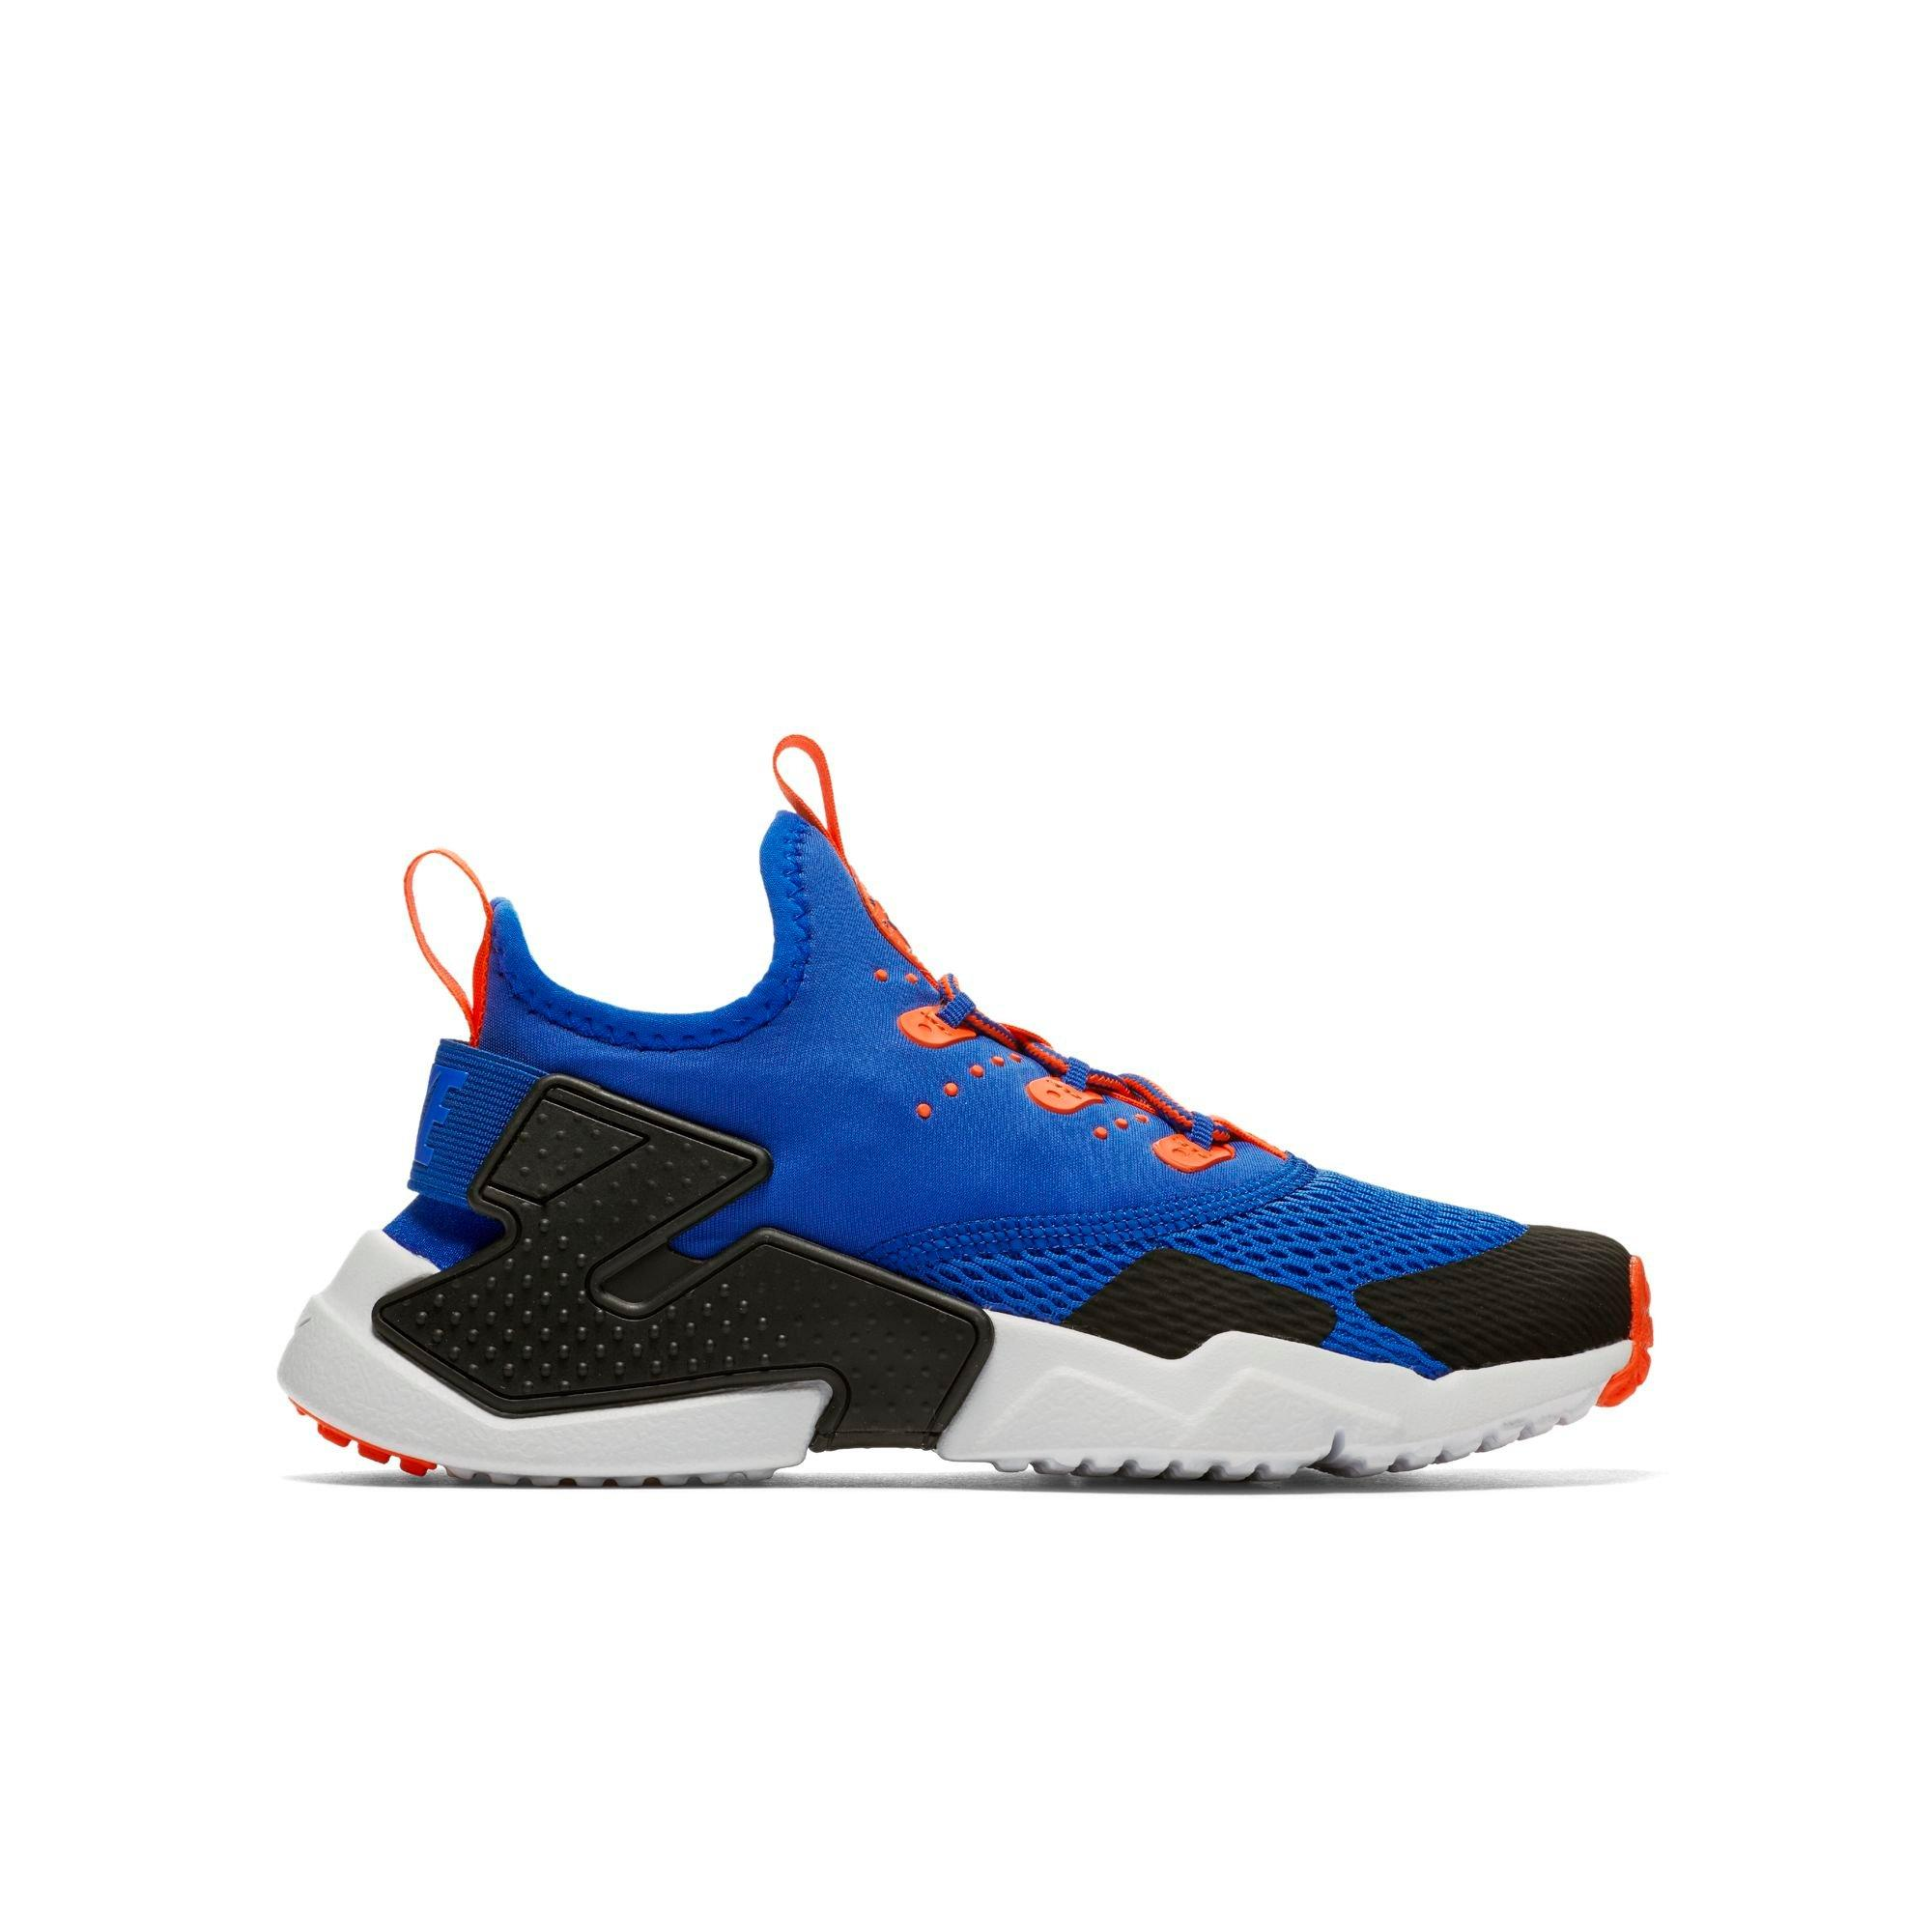 exclusivo Nike Huarache Platino Para Mujer Blancos Converse Footaction barato genuina de descuento footlocker salida precio barato barato TzFwM